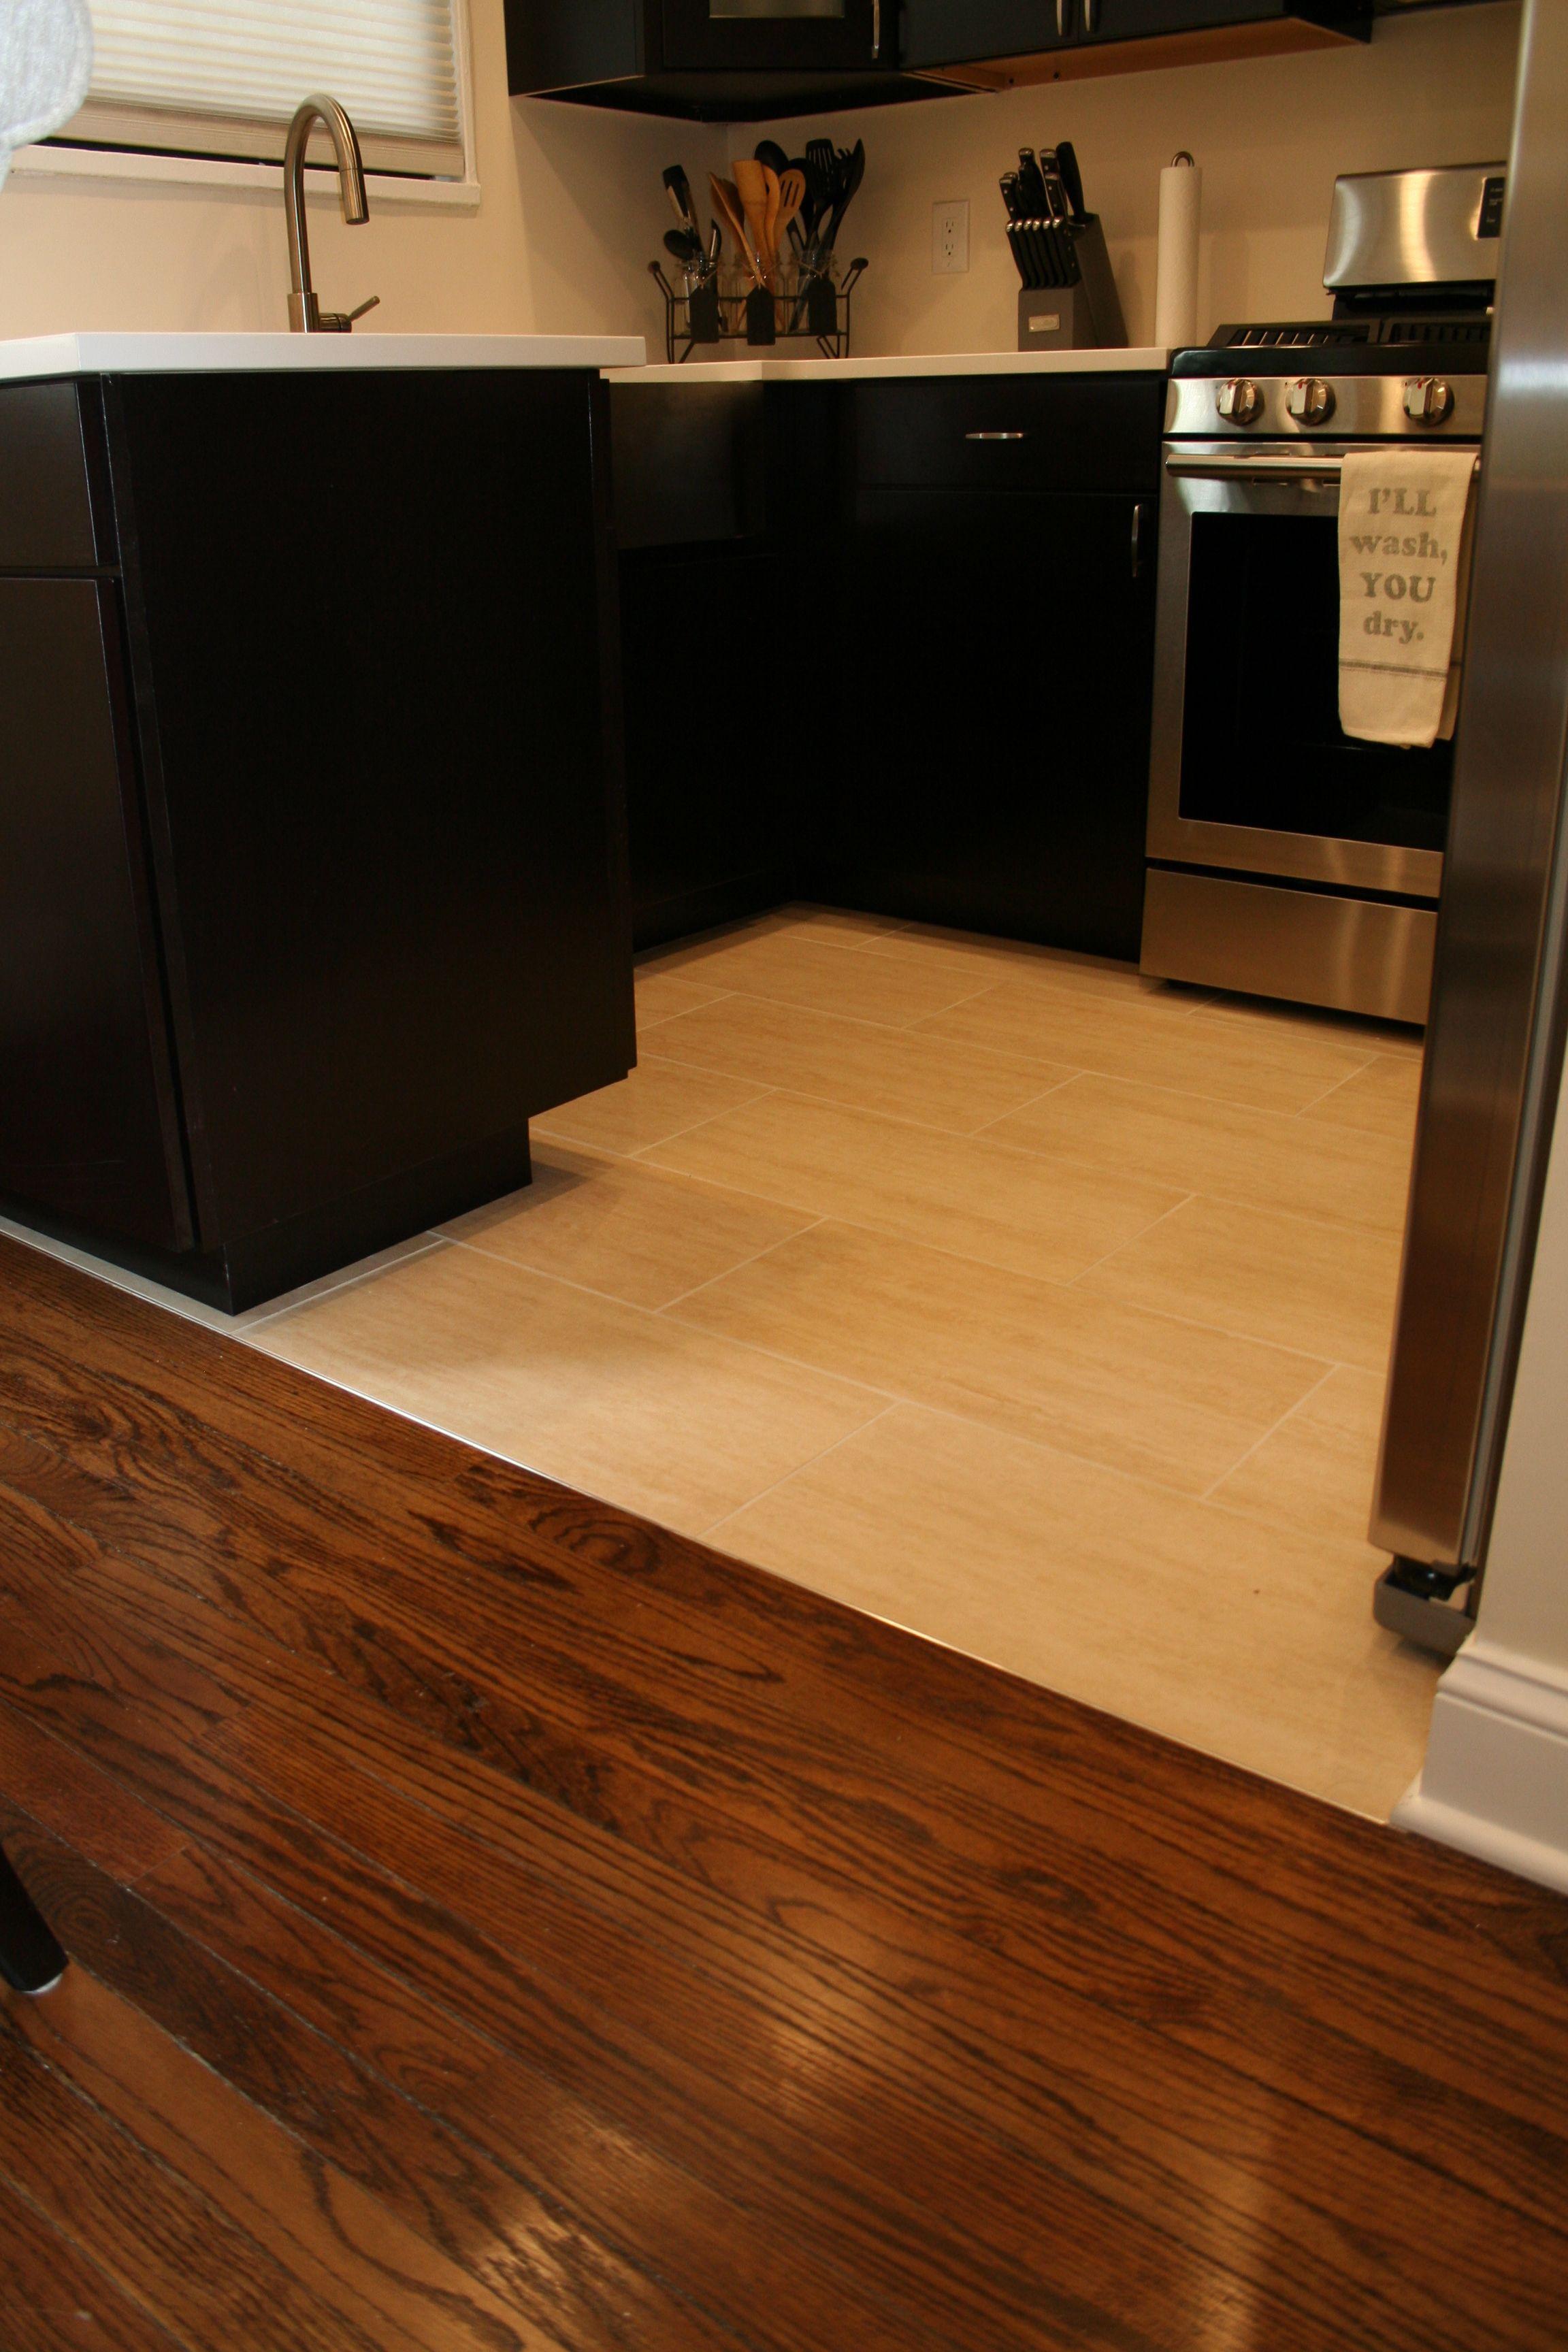 dark espresso hardwood floors of pin by kabinet king on our work pinterest flooring tiles and intended for dark wood floors beautiful dark wood floors love the dark bamboo floors and pewter walls